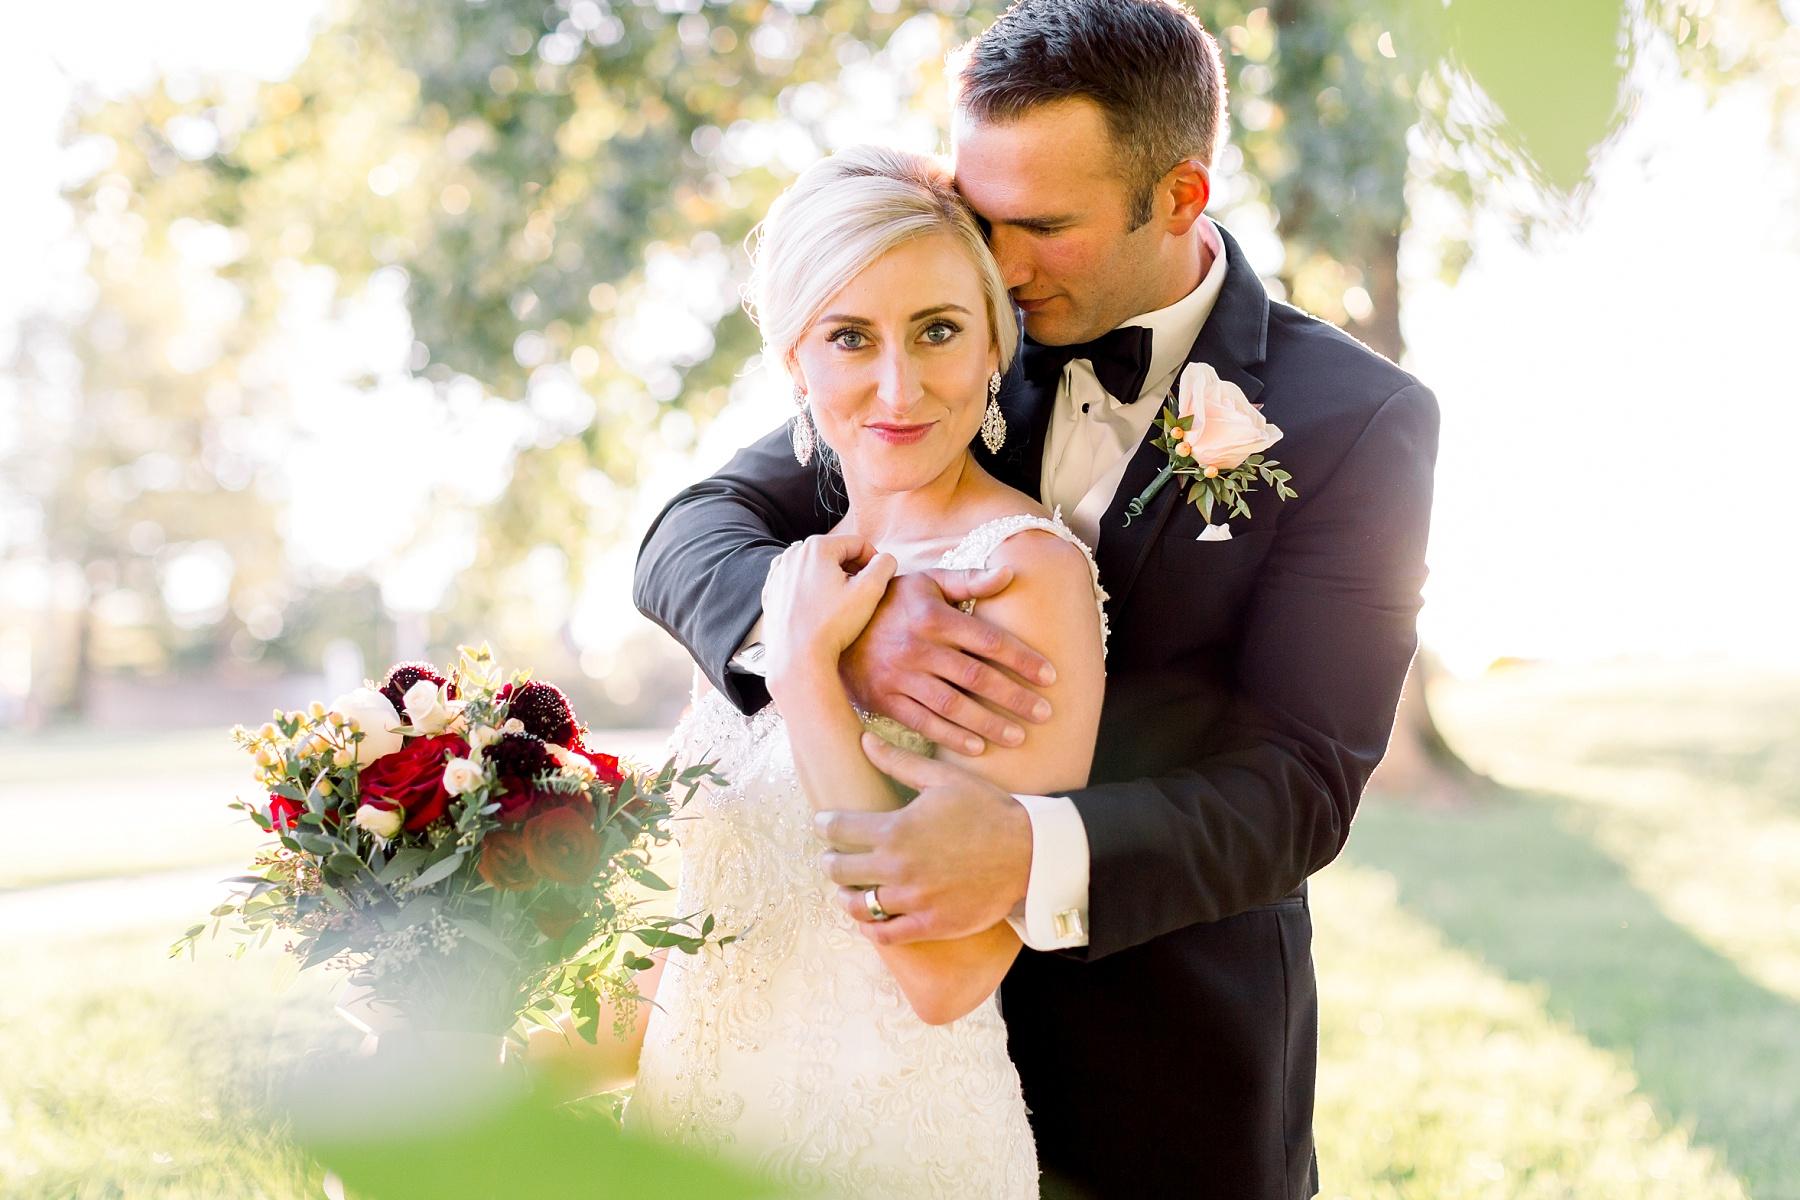 midwest-adventurous-wedding-photographer-elizabeth-ladean-photography-photo_4811.jpg